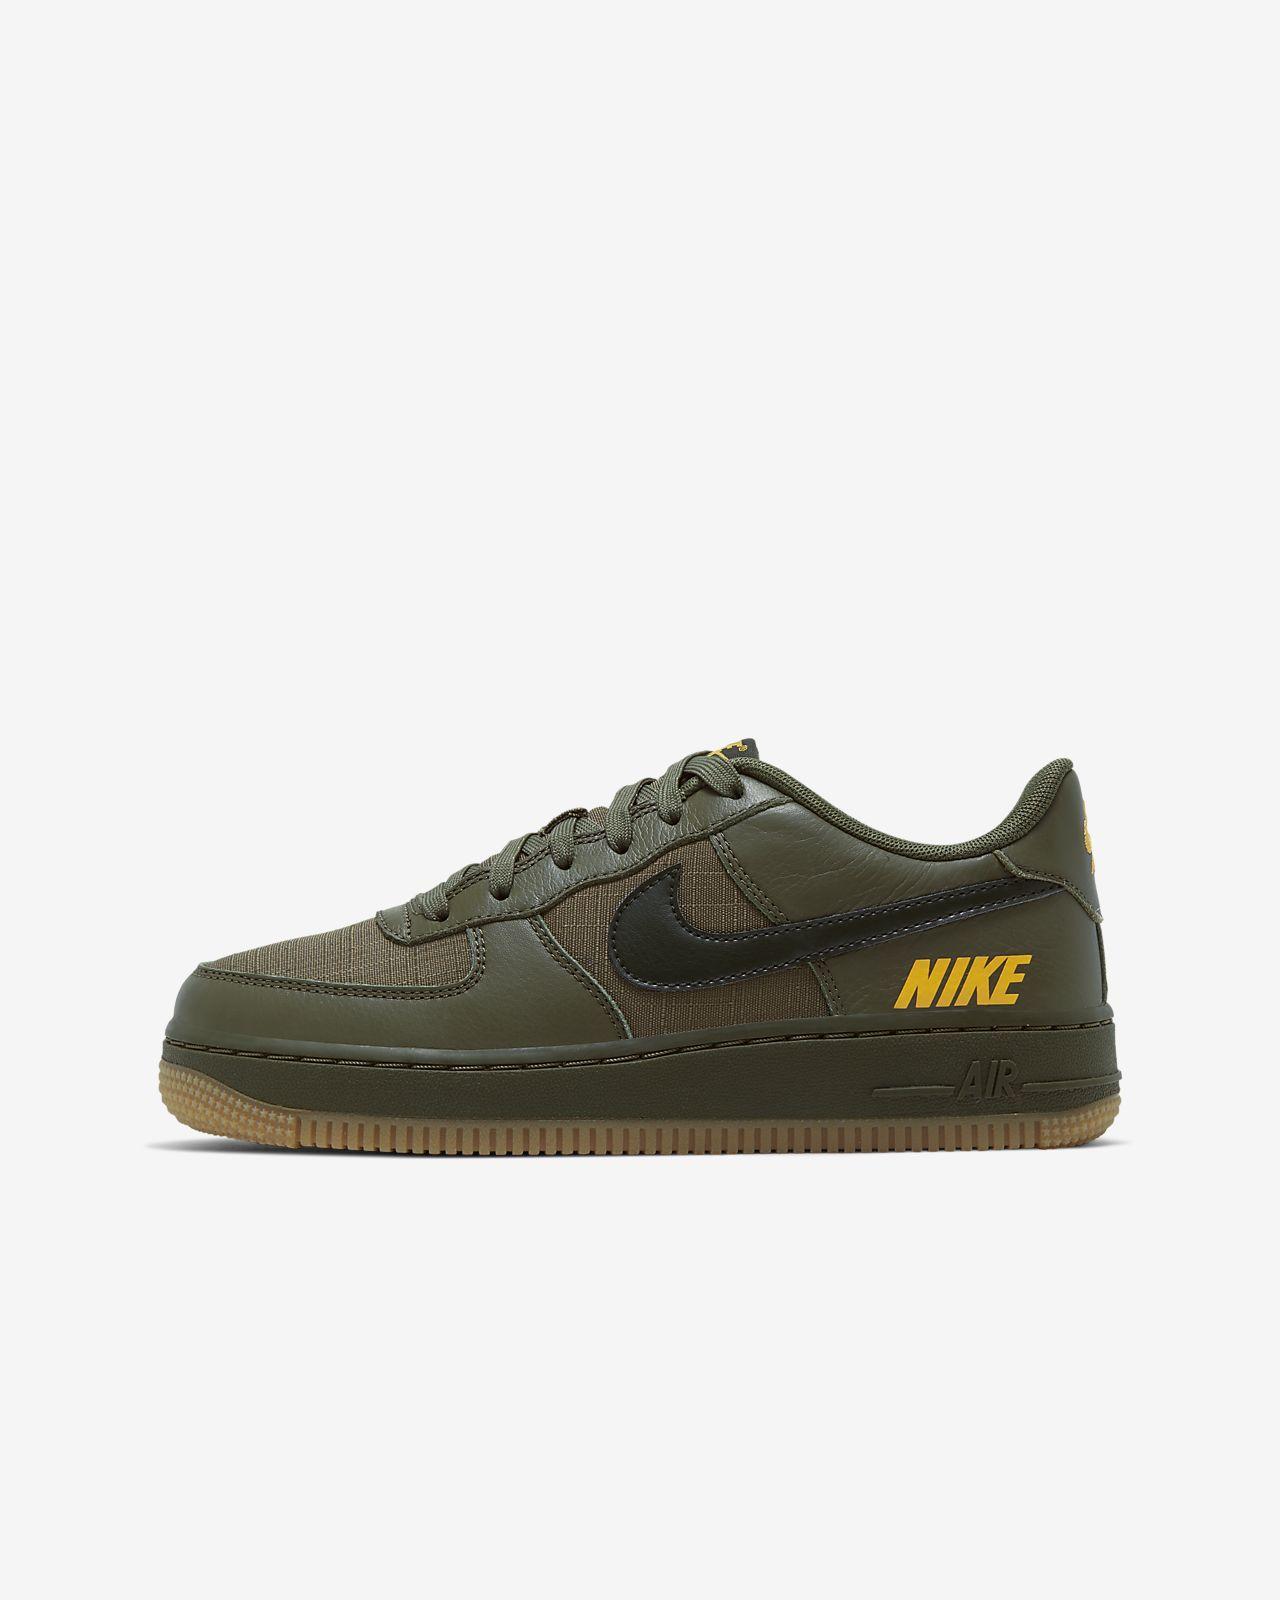 Nike Air Force 1 LV8 5 Older Kids' Shoe